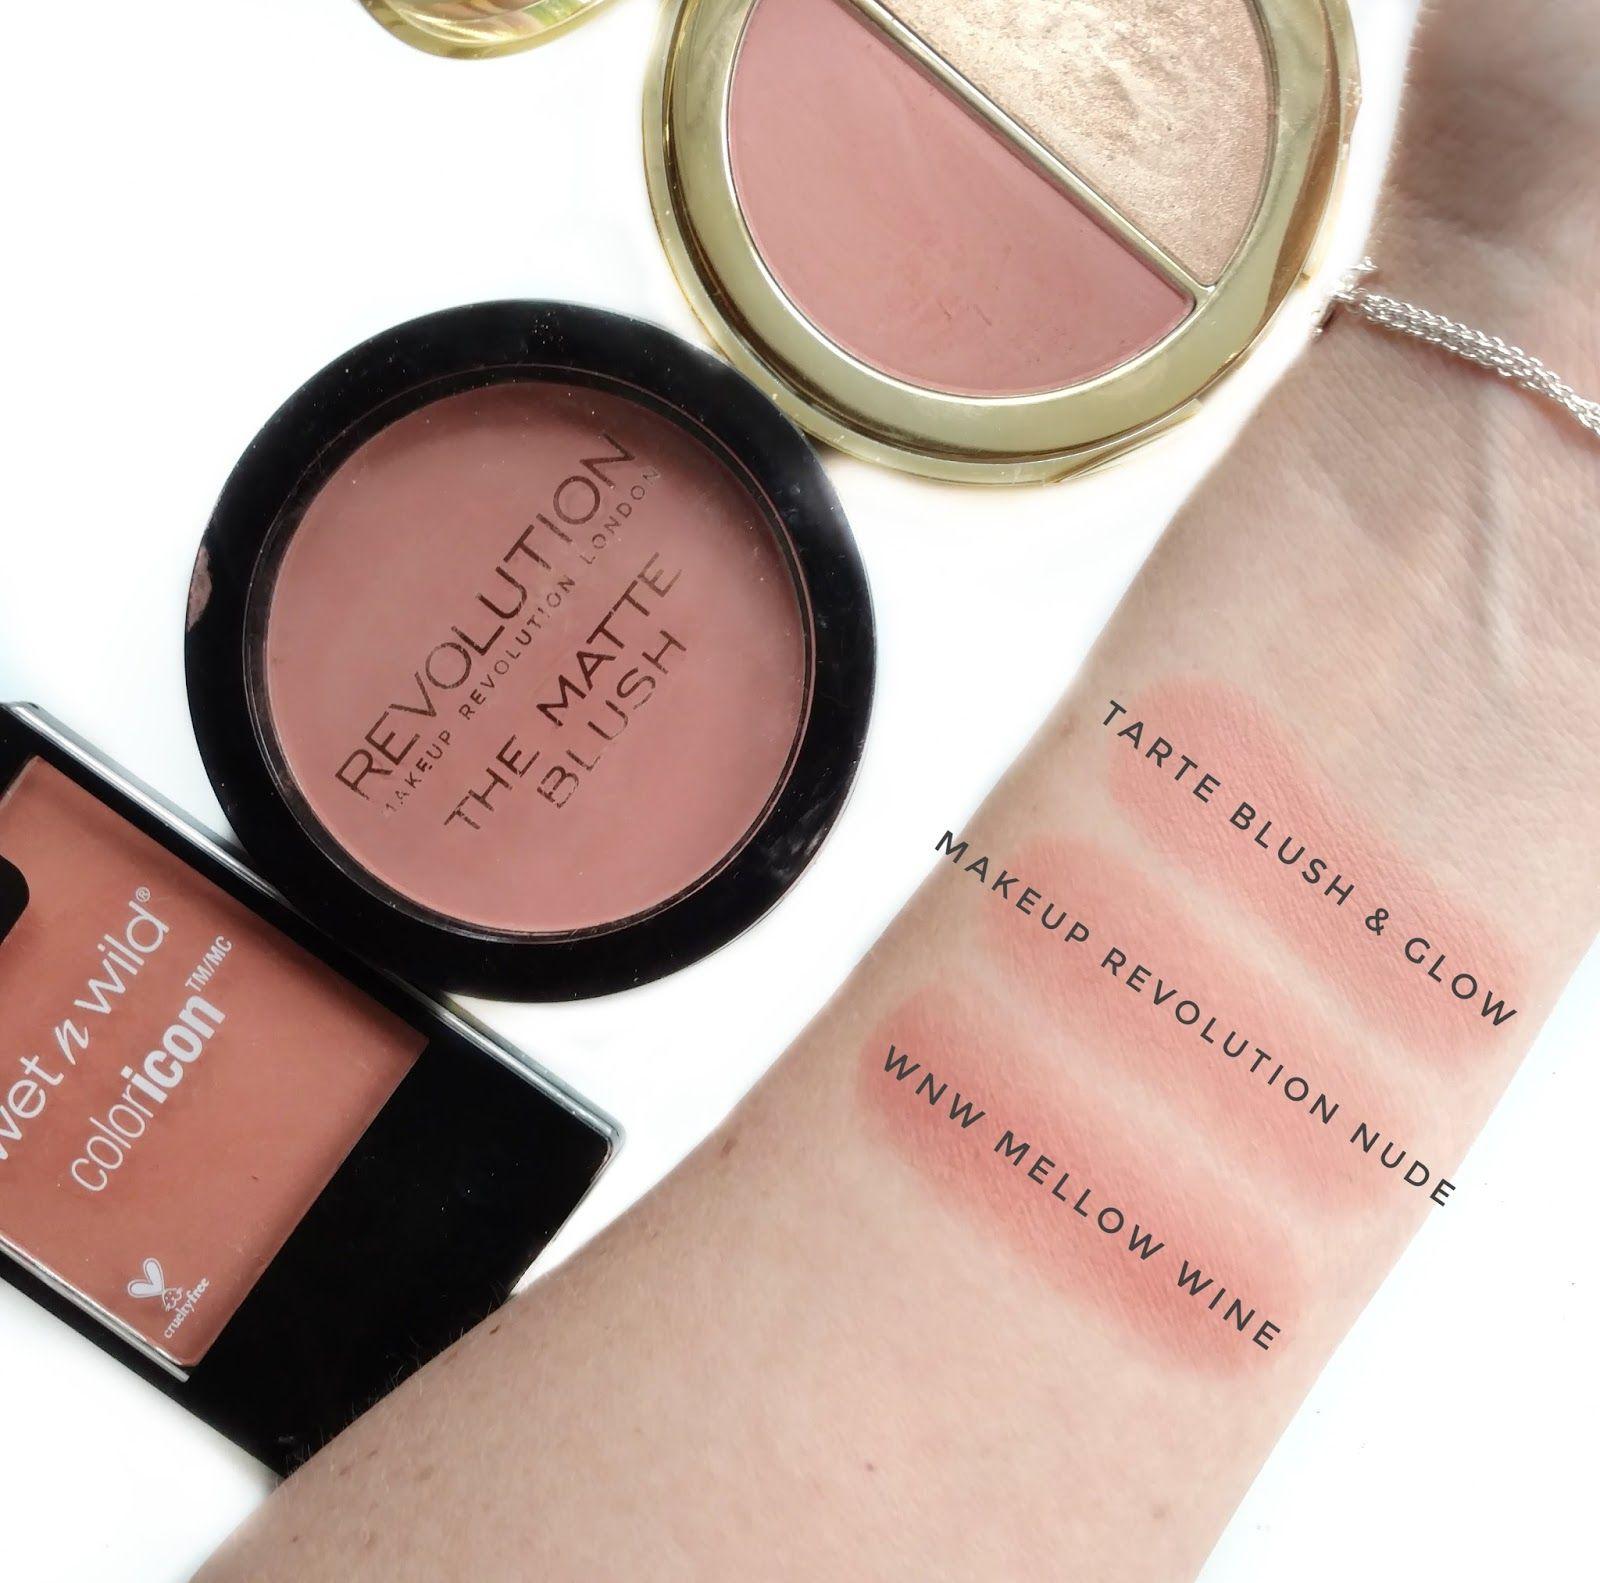 Tarte Blush & Glow Duo Review & Swatches Tarte blush